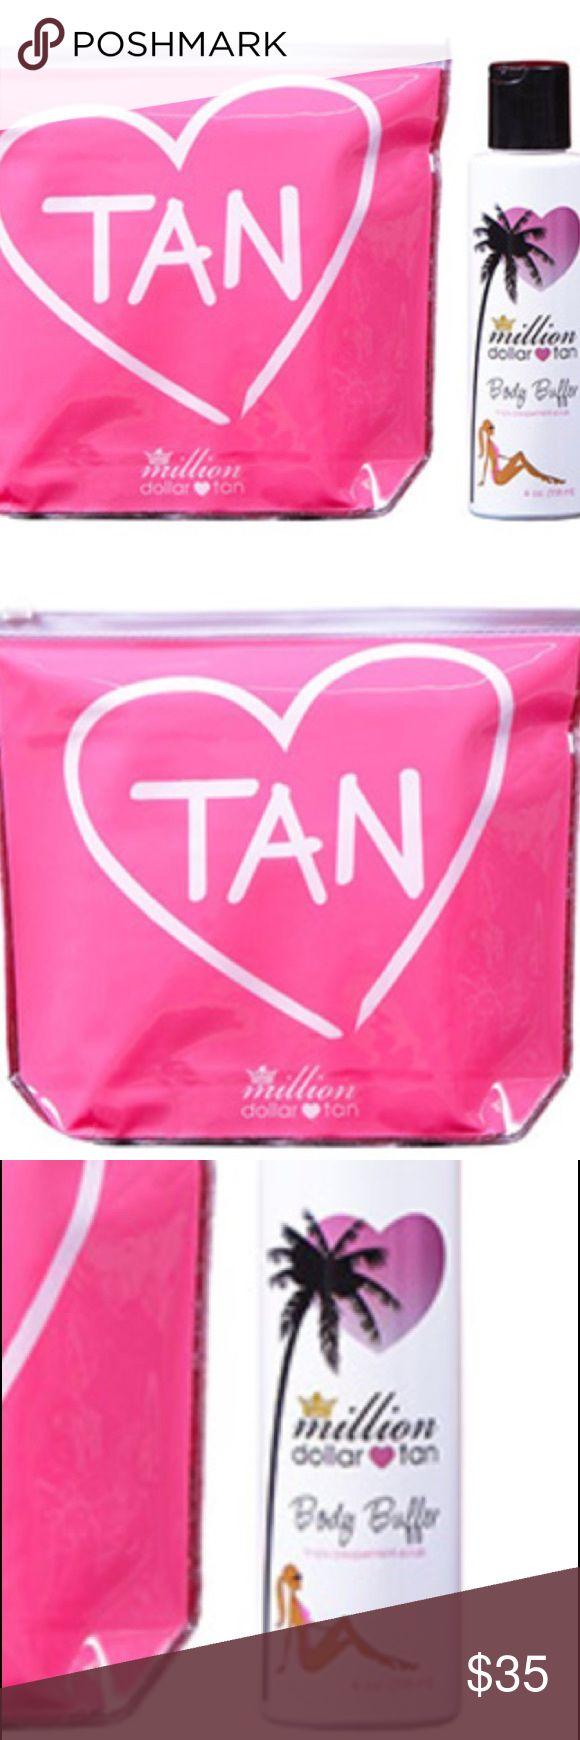 Million dollar tan beauty bundle pink pouch and a full-size Body Buffer Tingly Peppermint Body Scrub (4 oz.) million dollar tan Makeup